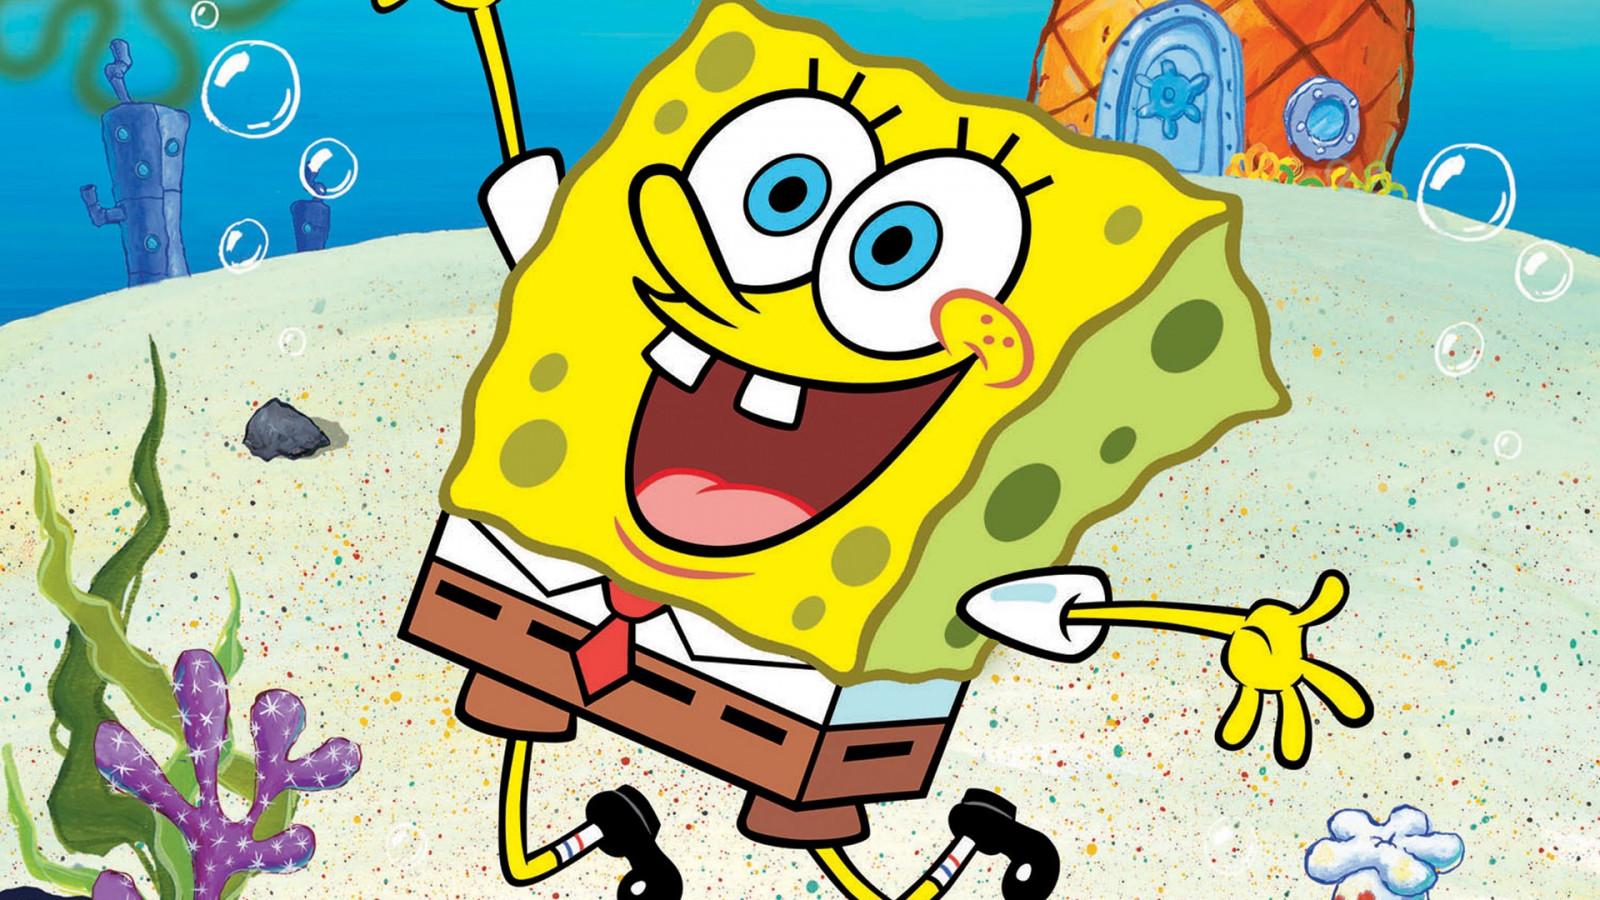 Wallpaper : illustration, cartoon, SpongeBob SquarePants, ART ...